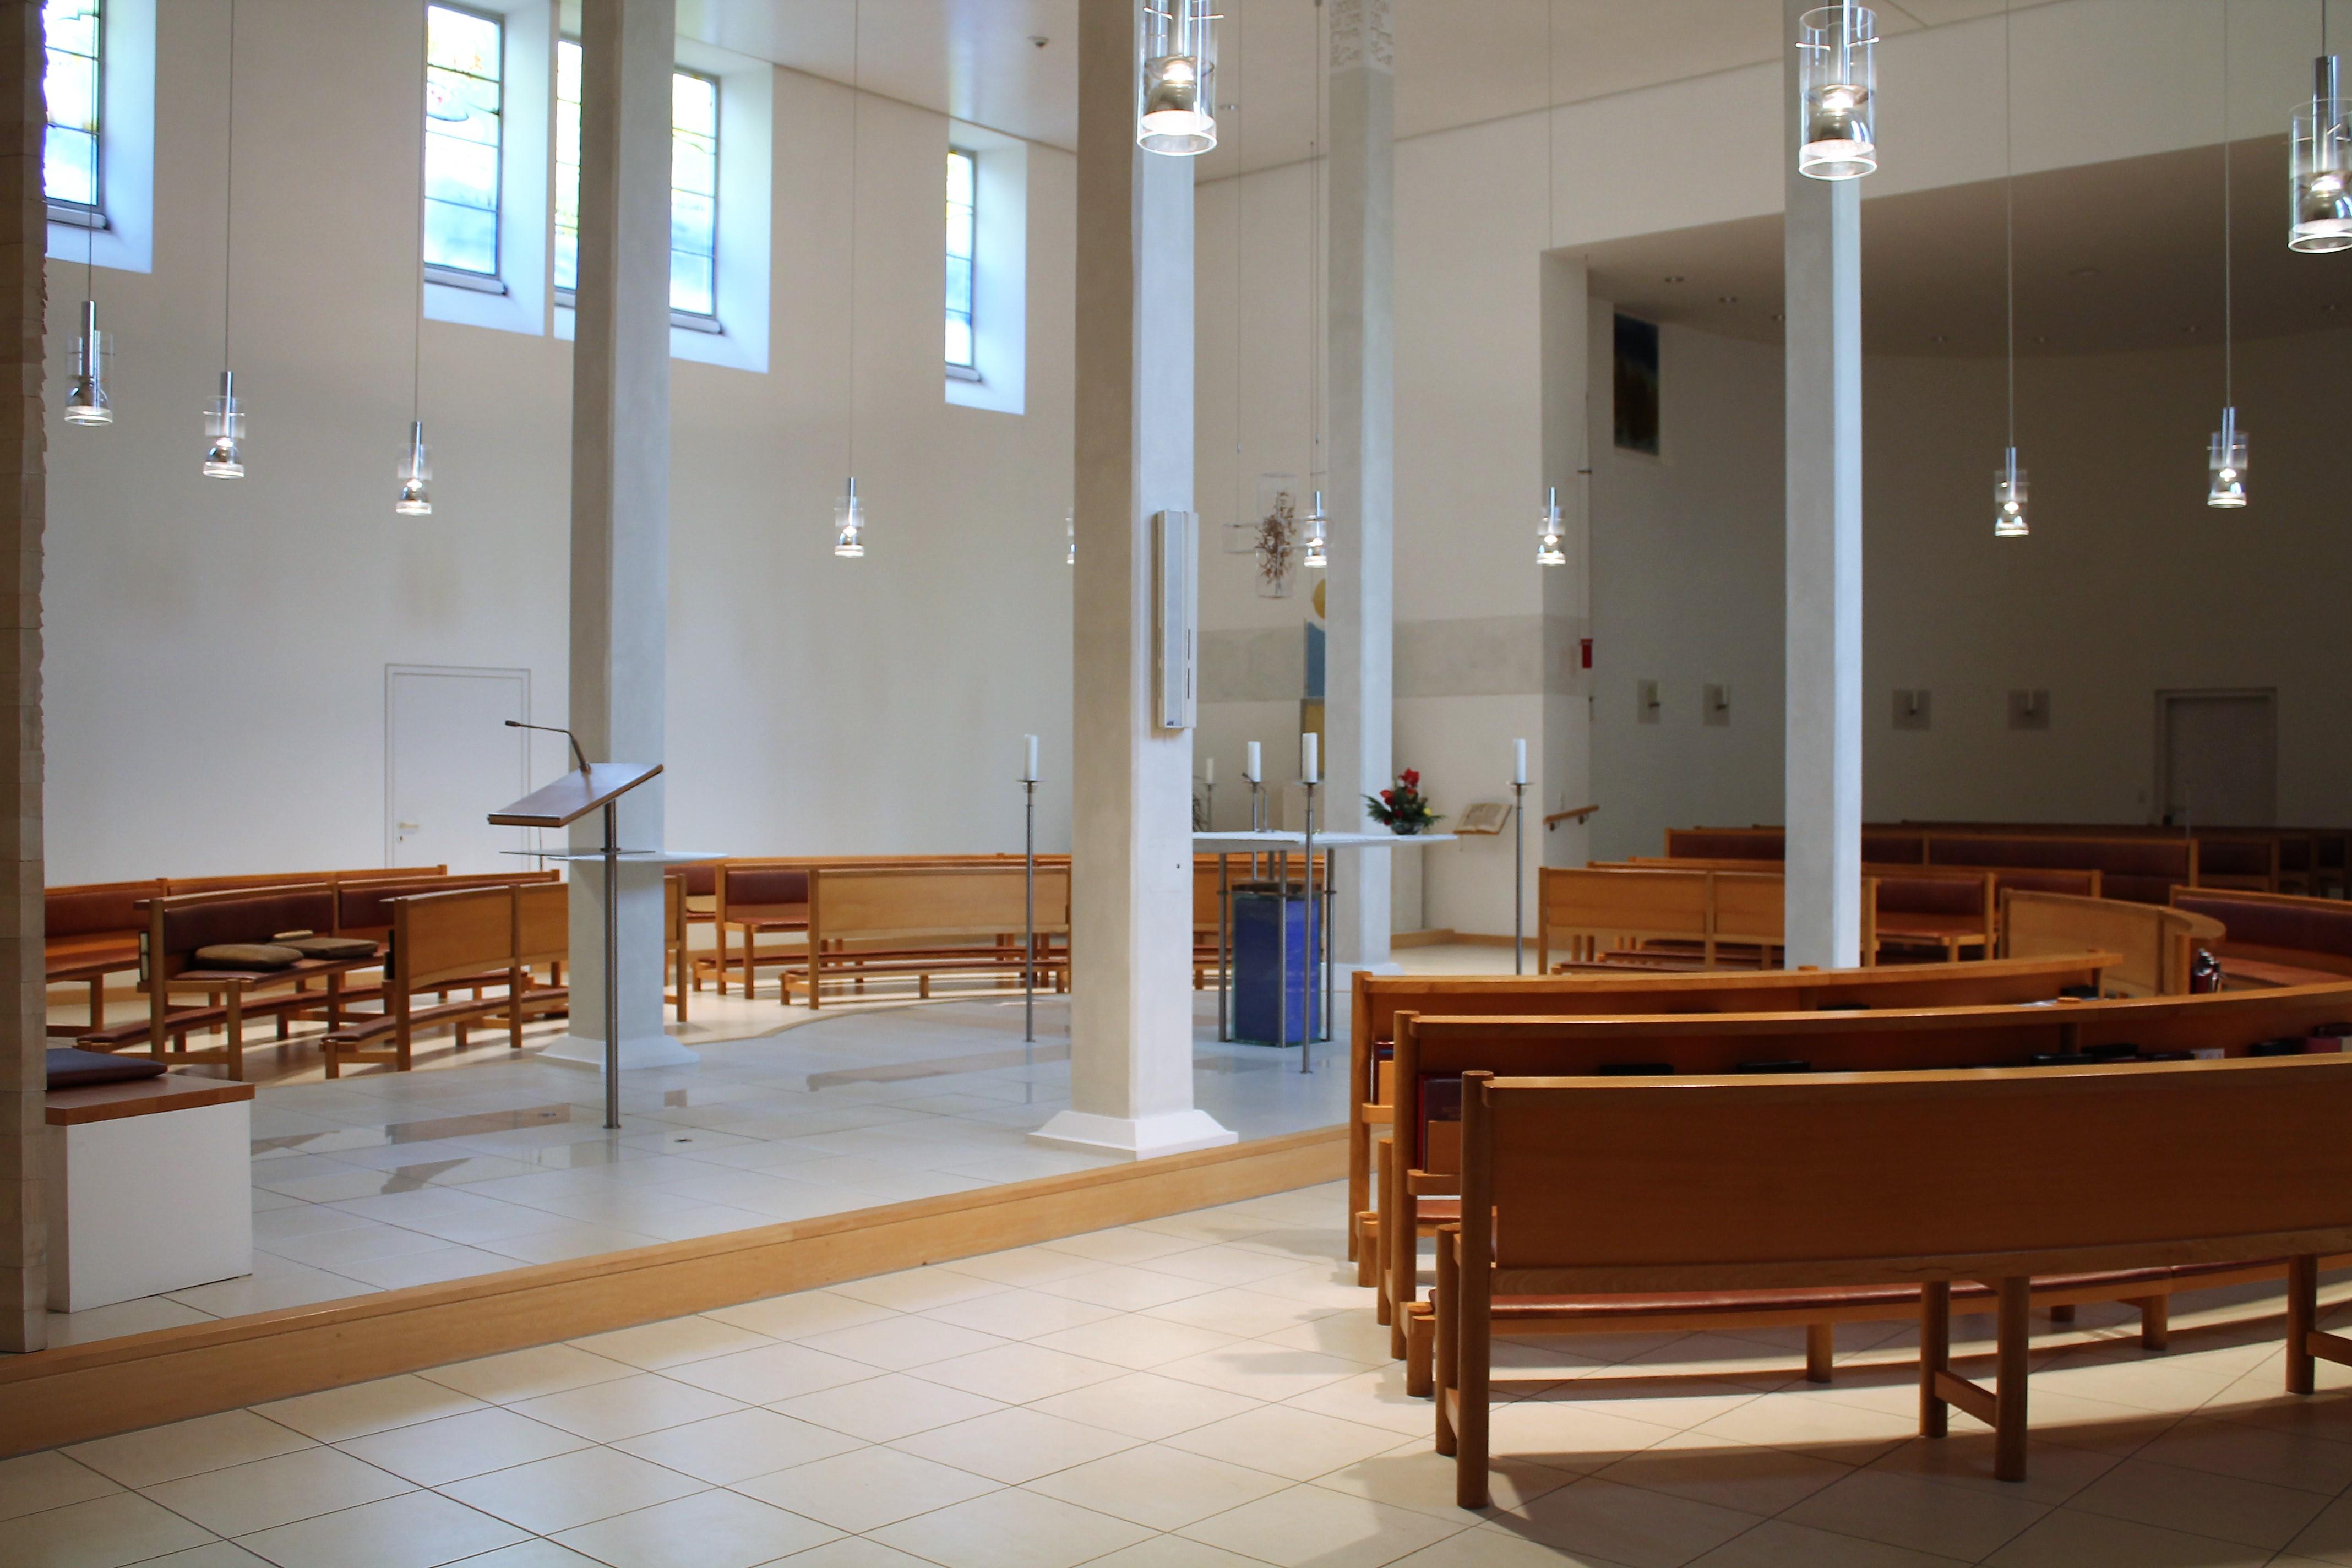 Kapelle Gesamt Rechts